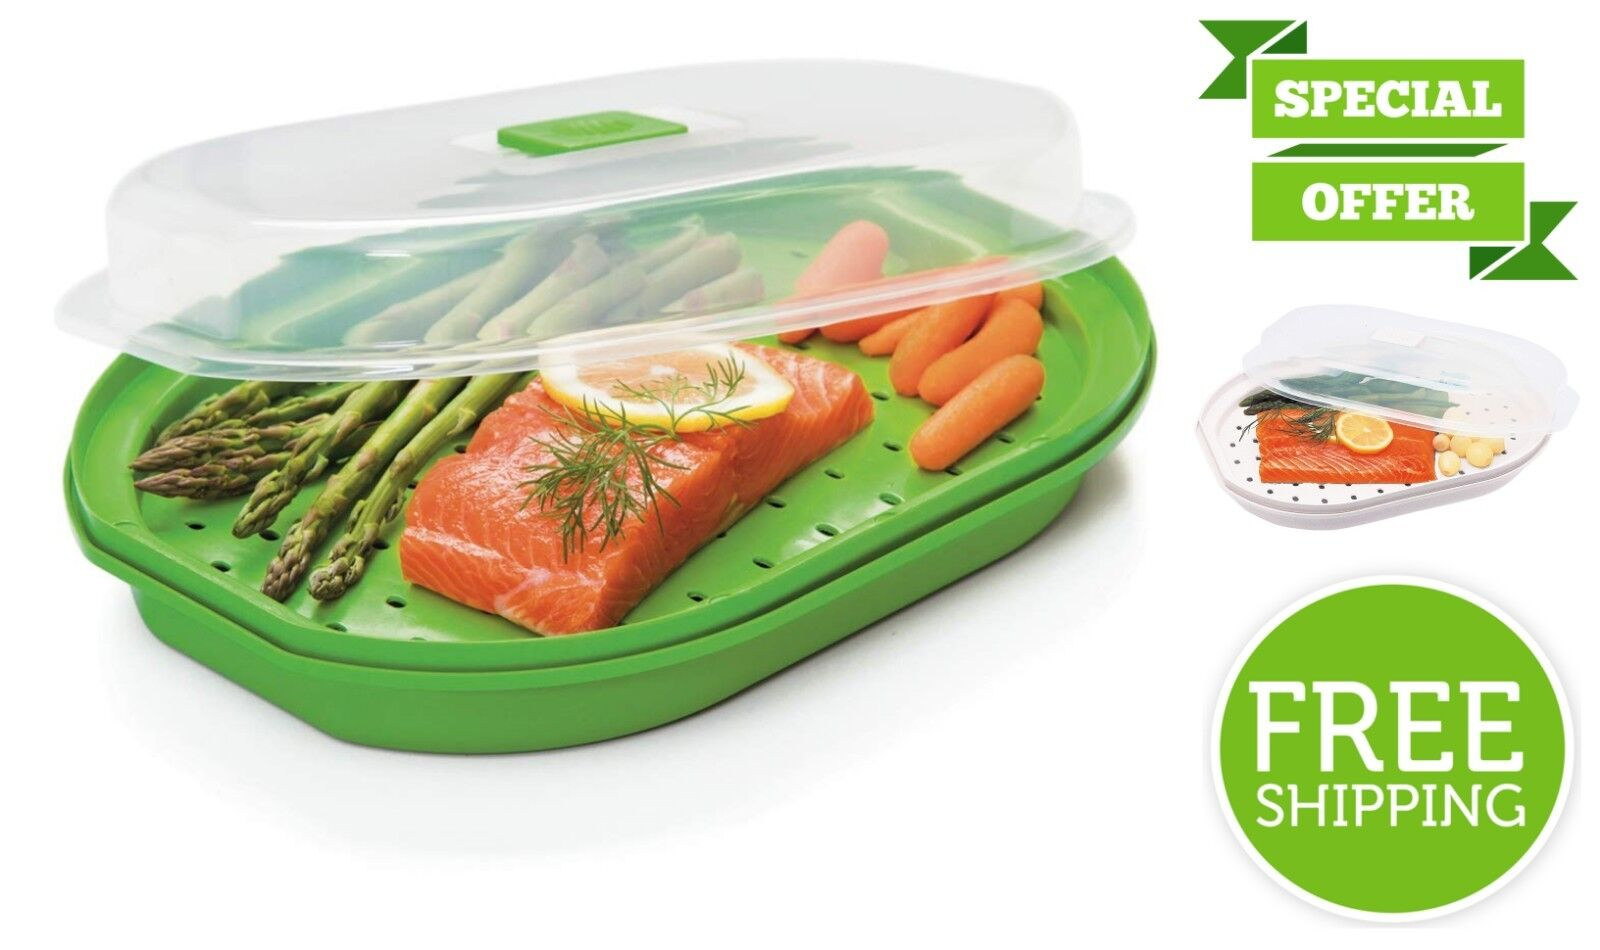 Microwavable Fish and Veggie Steamer Vegetable BPA Free Stea